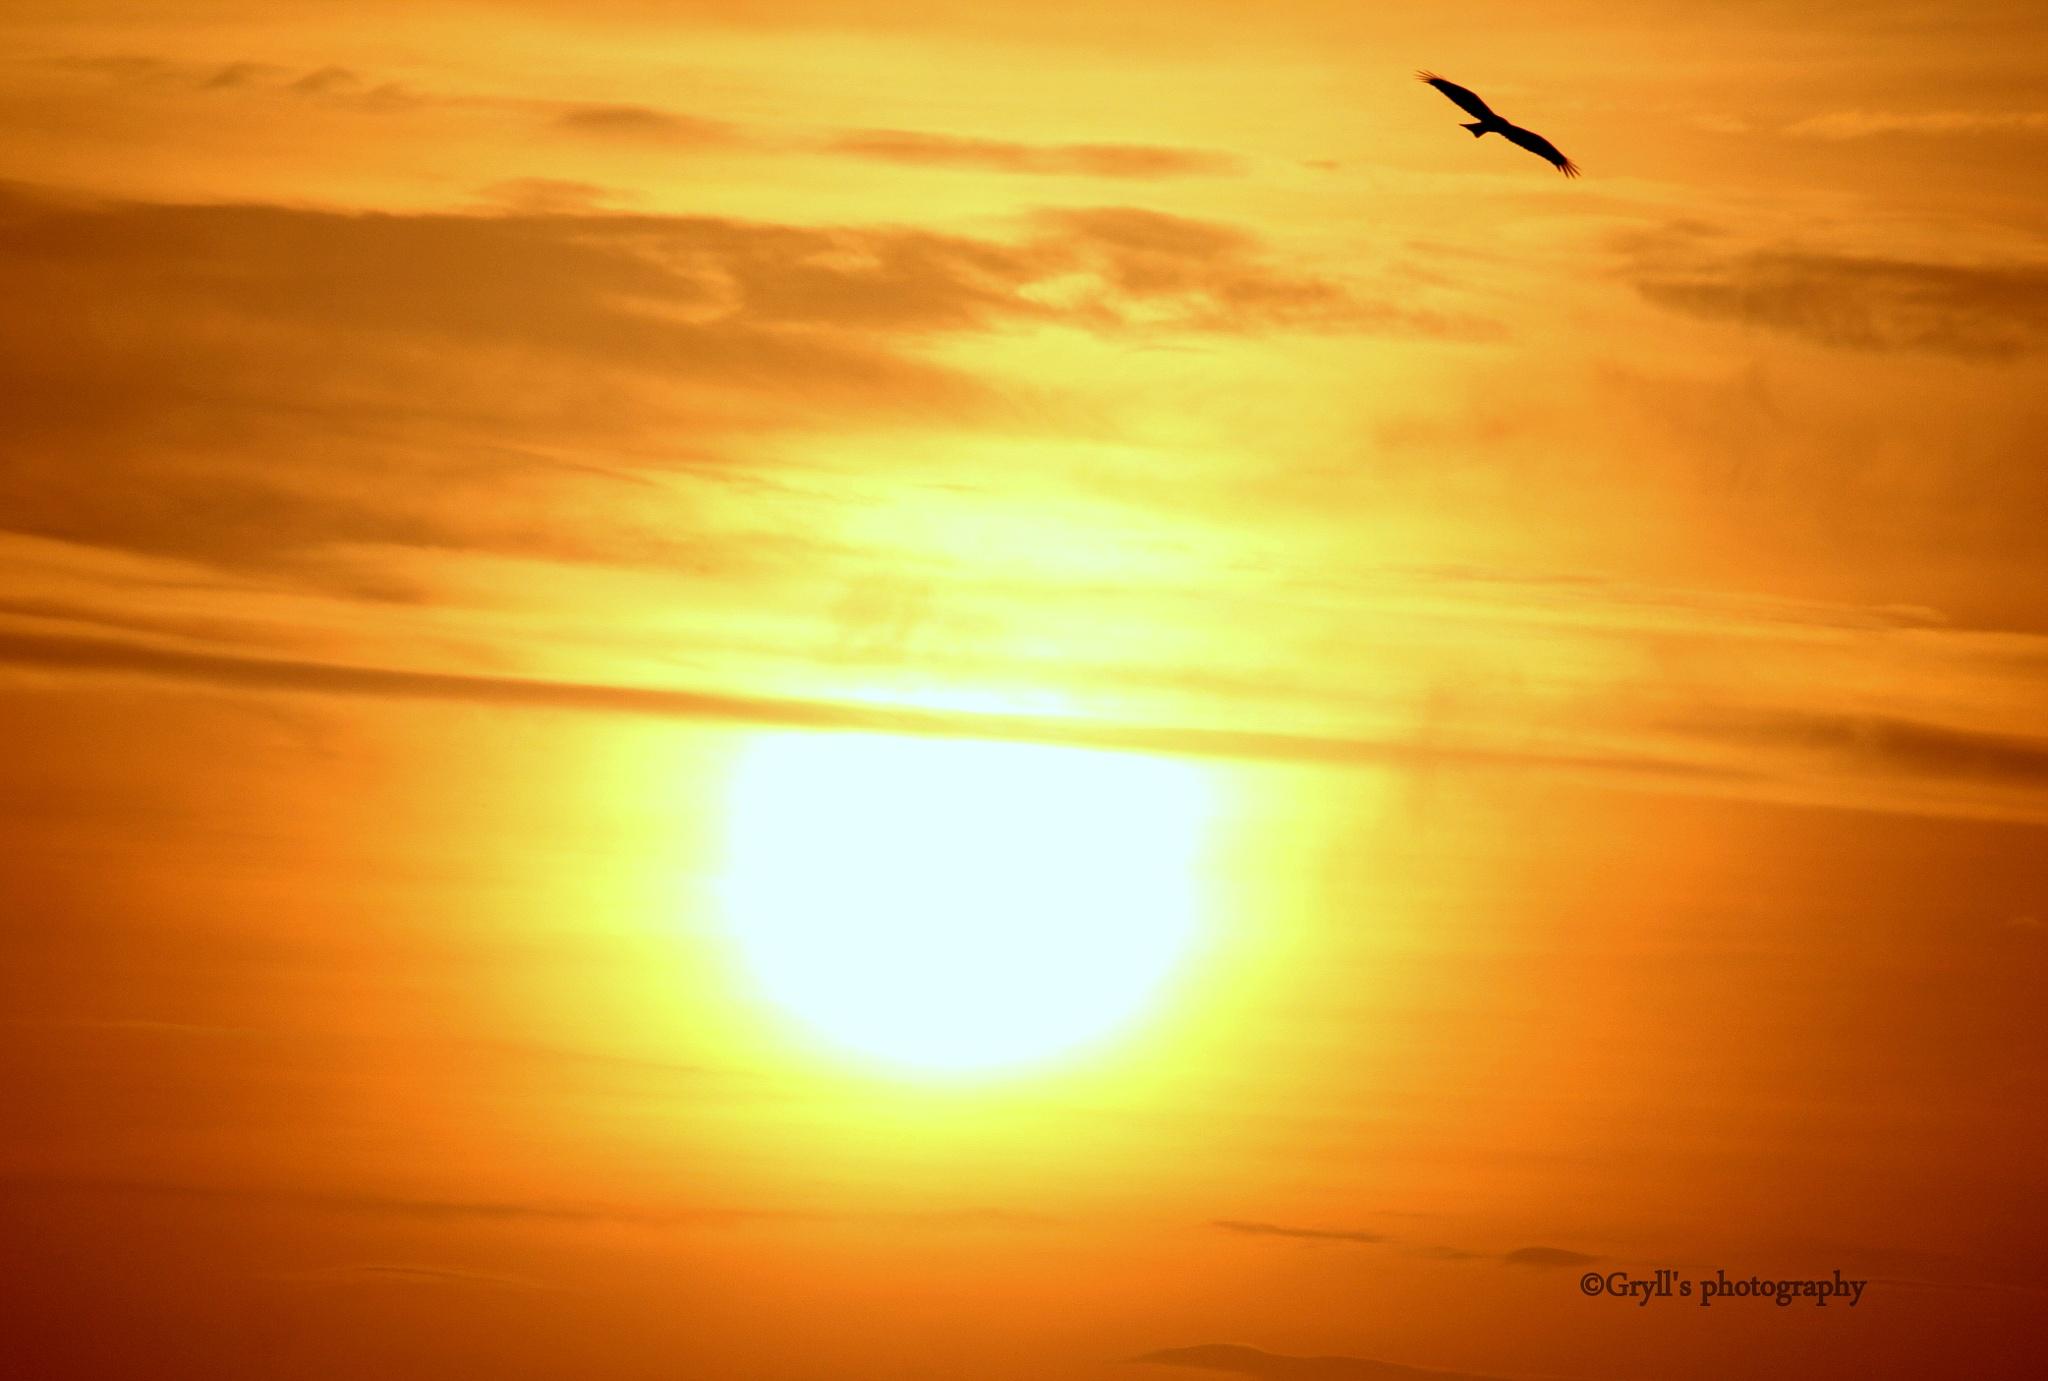 a better evening by Girish Grylls